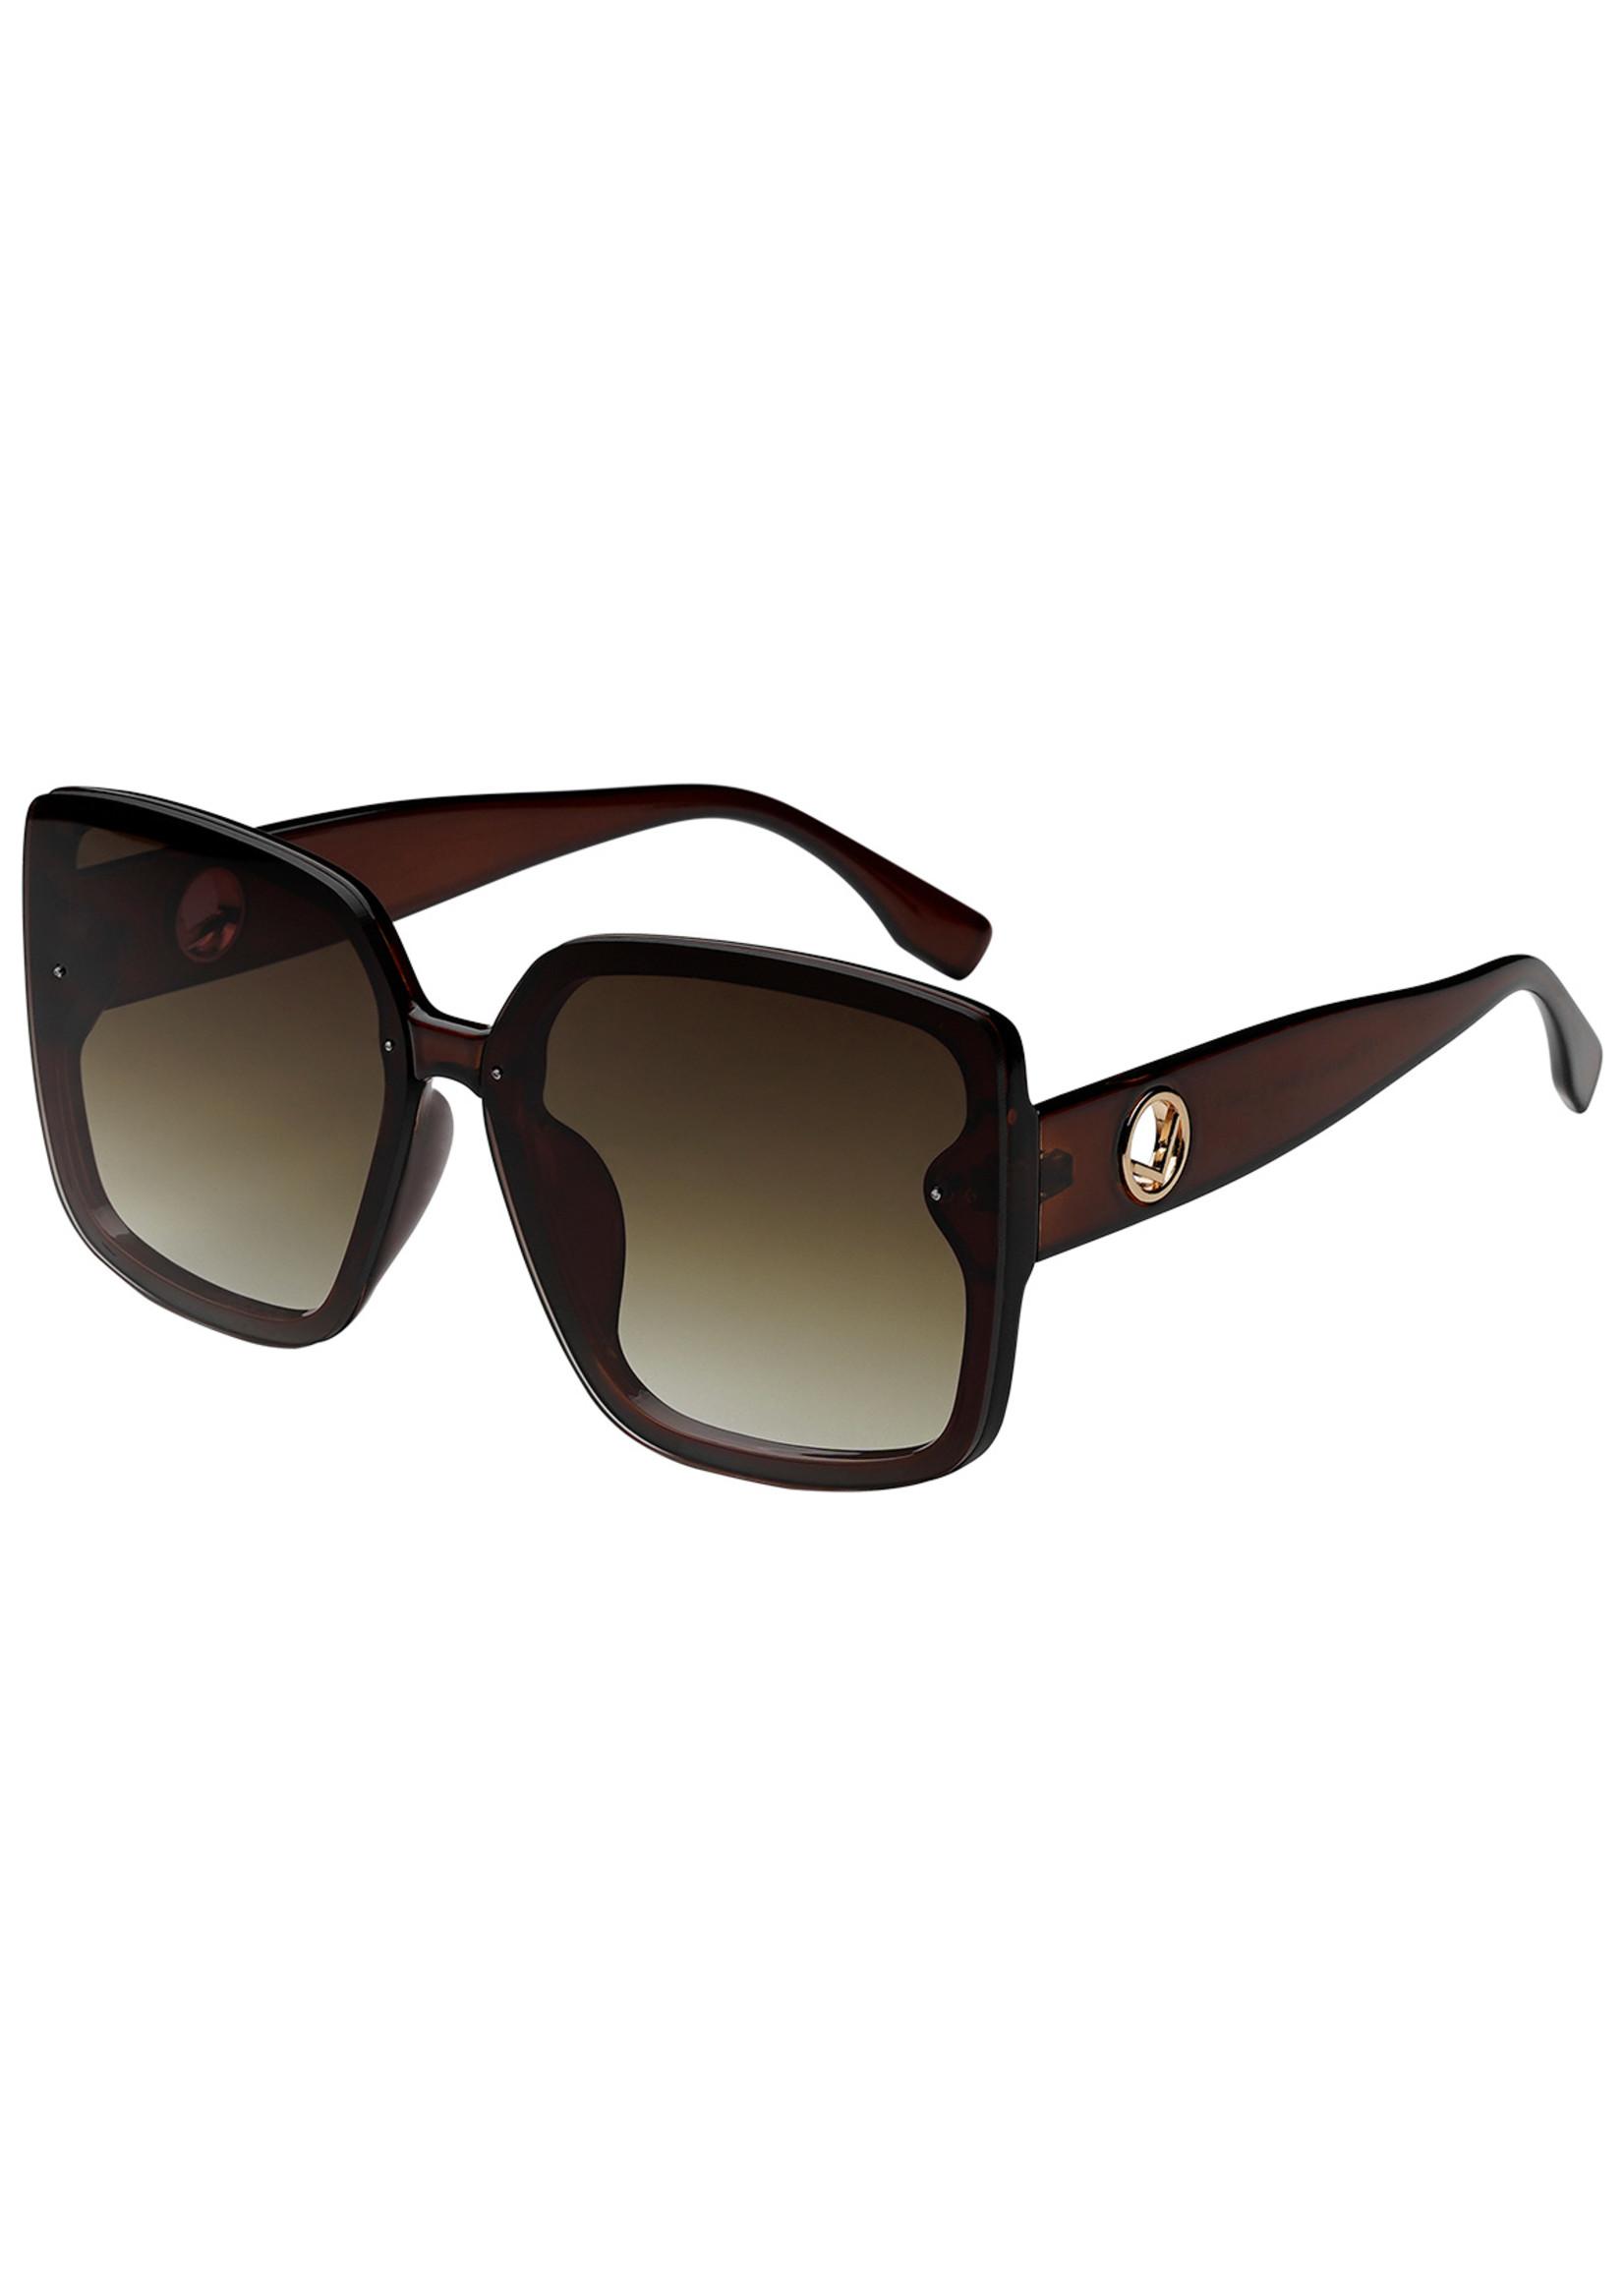 Ladybugs Vierkante zonnebril bruin